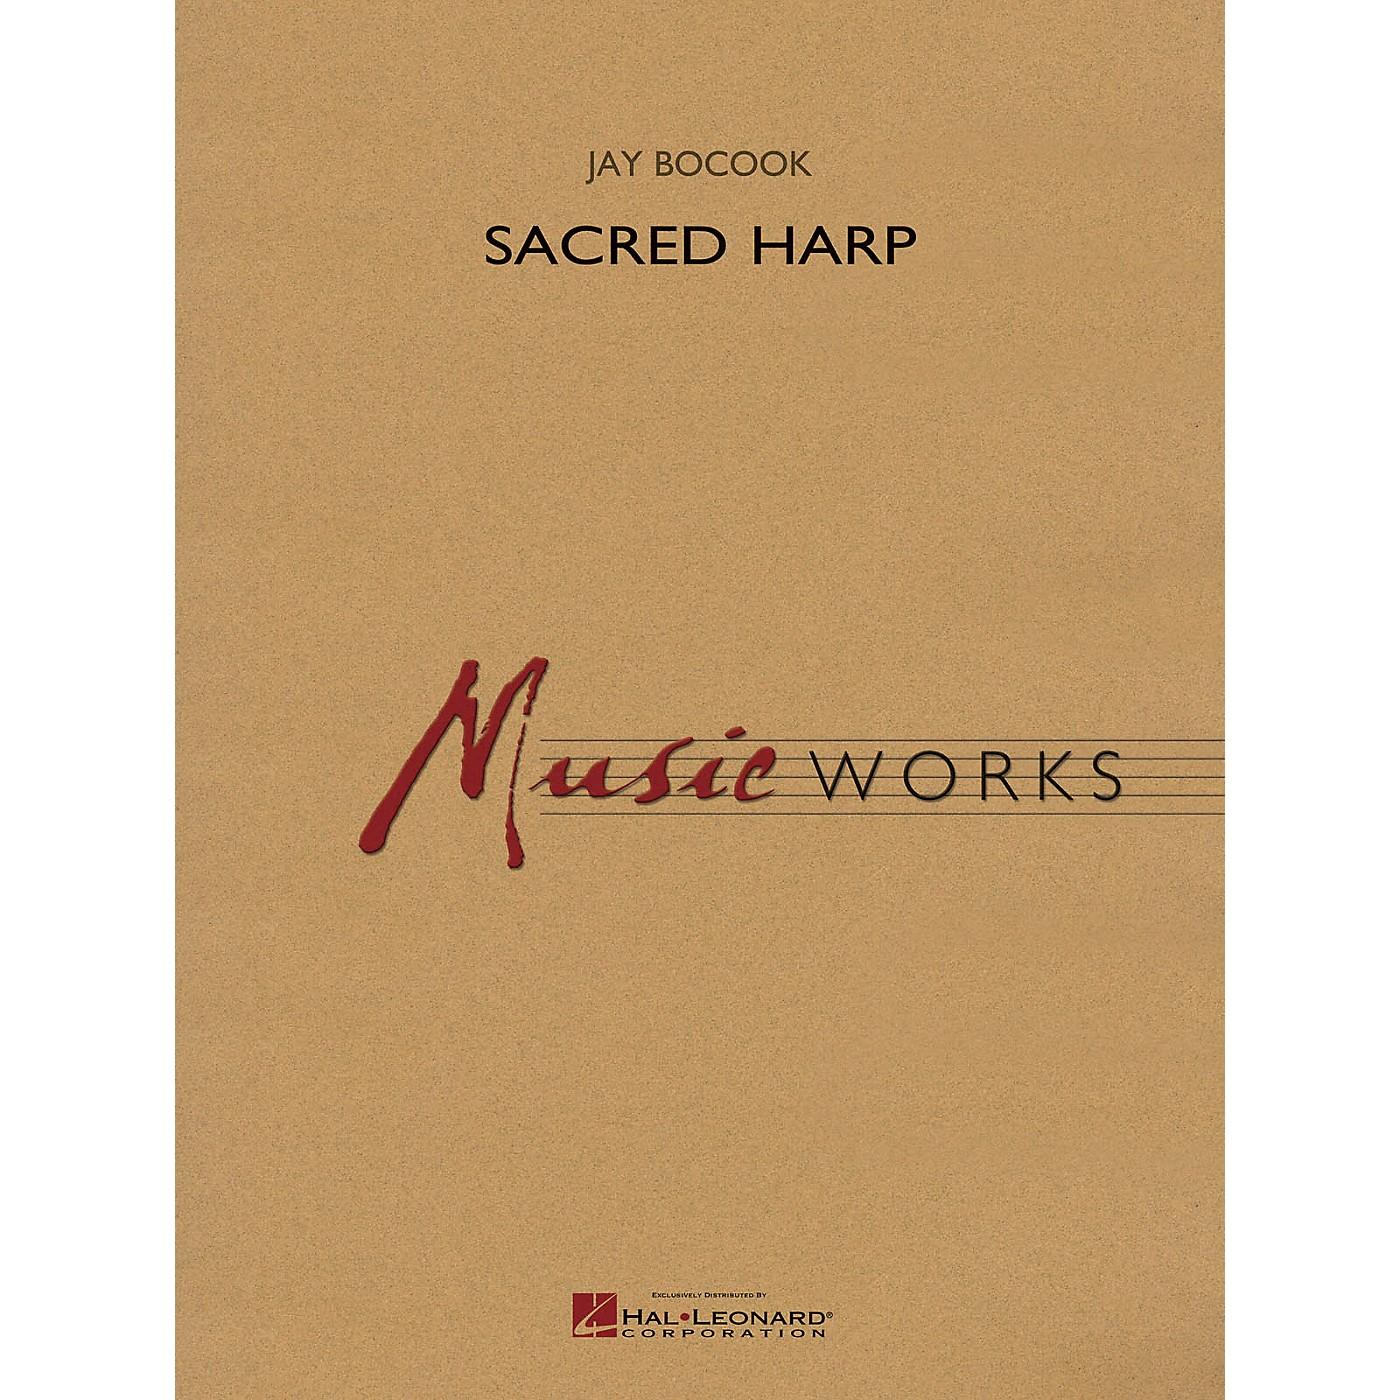 Hal Leonard Sacred Harp Concert Band Level 5 Composed by Jay Bocook thumbnail